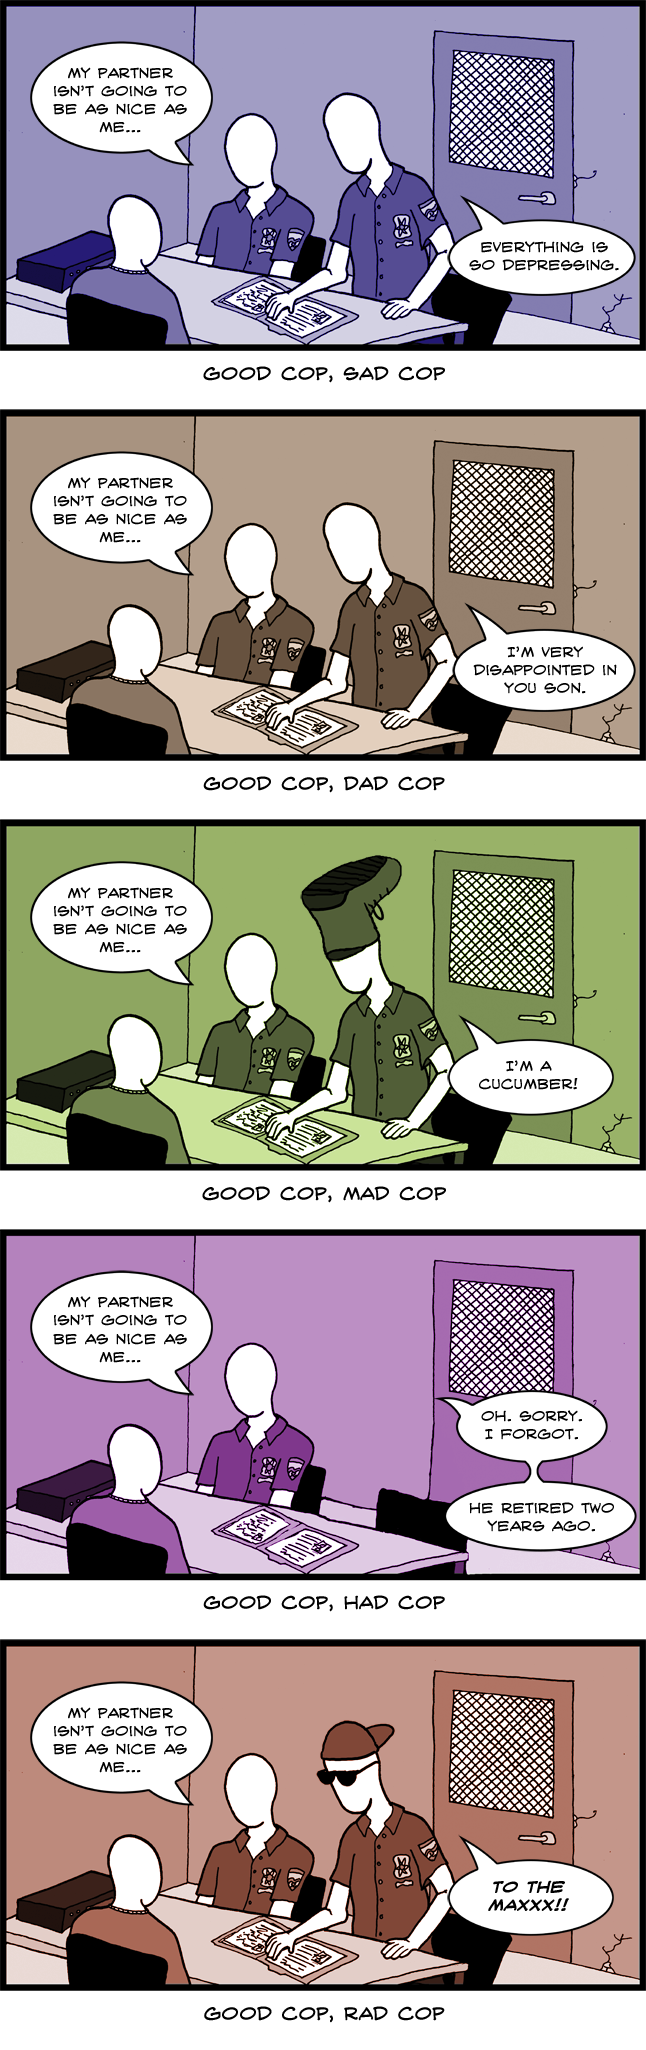 2009-09-14-goodcop